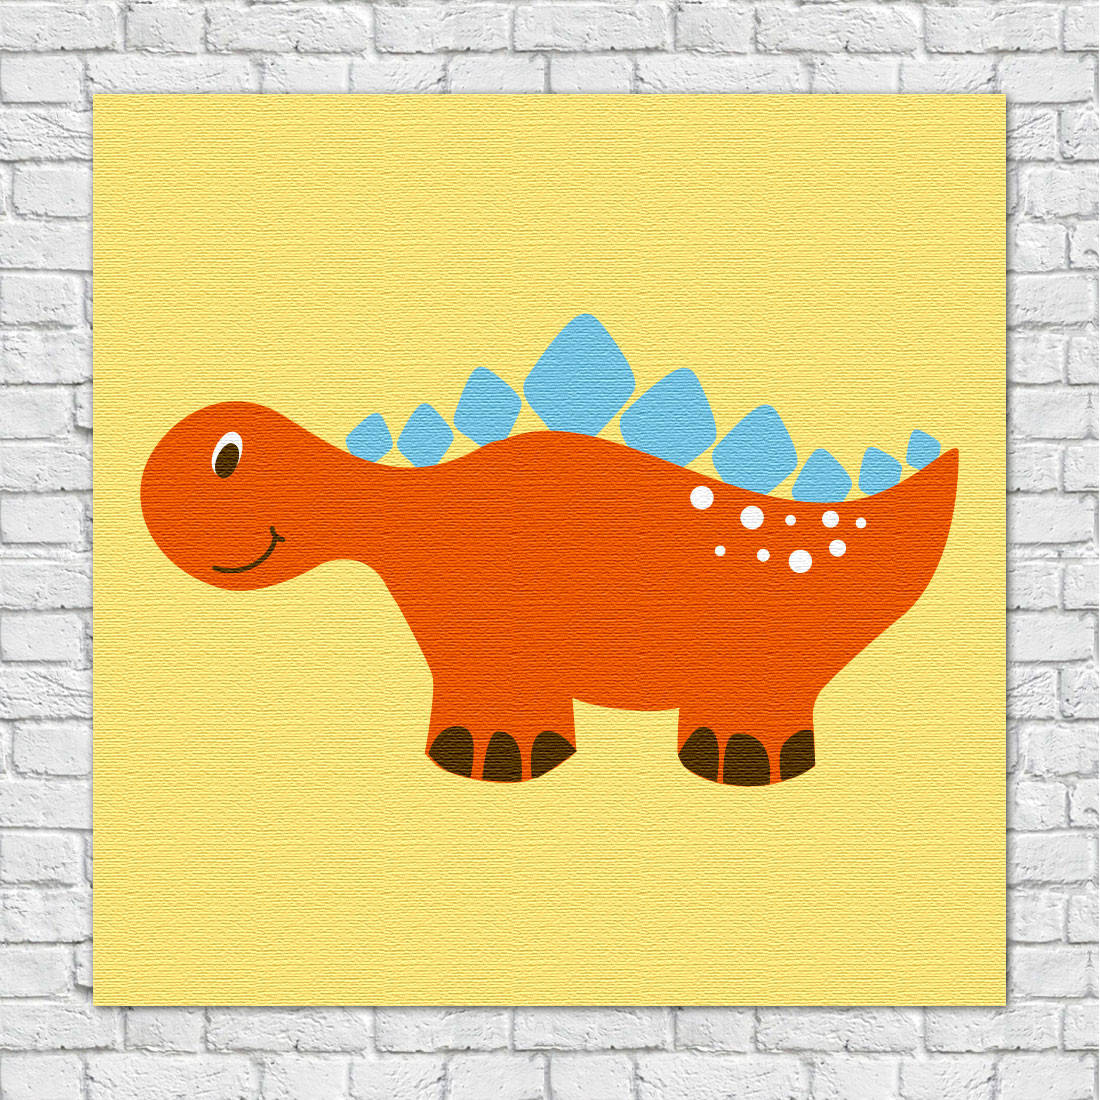 Quadro Decorativo Infantil Dinossauros Laranja